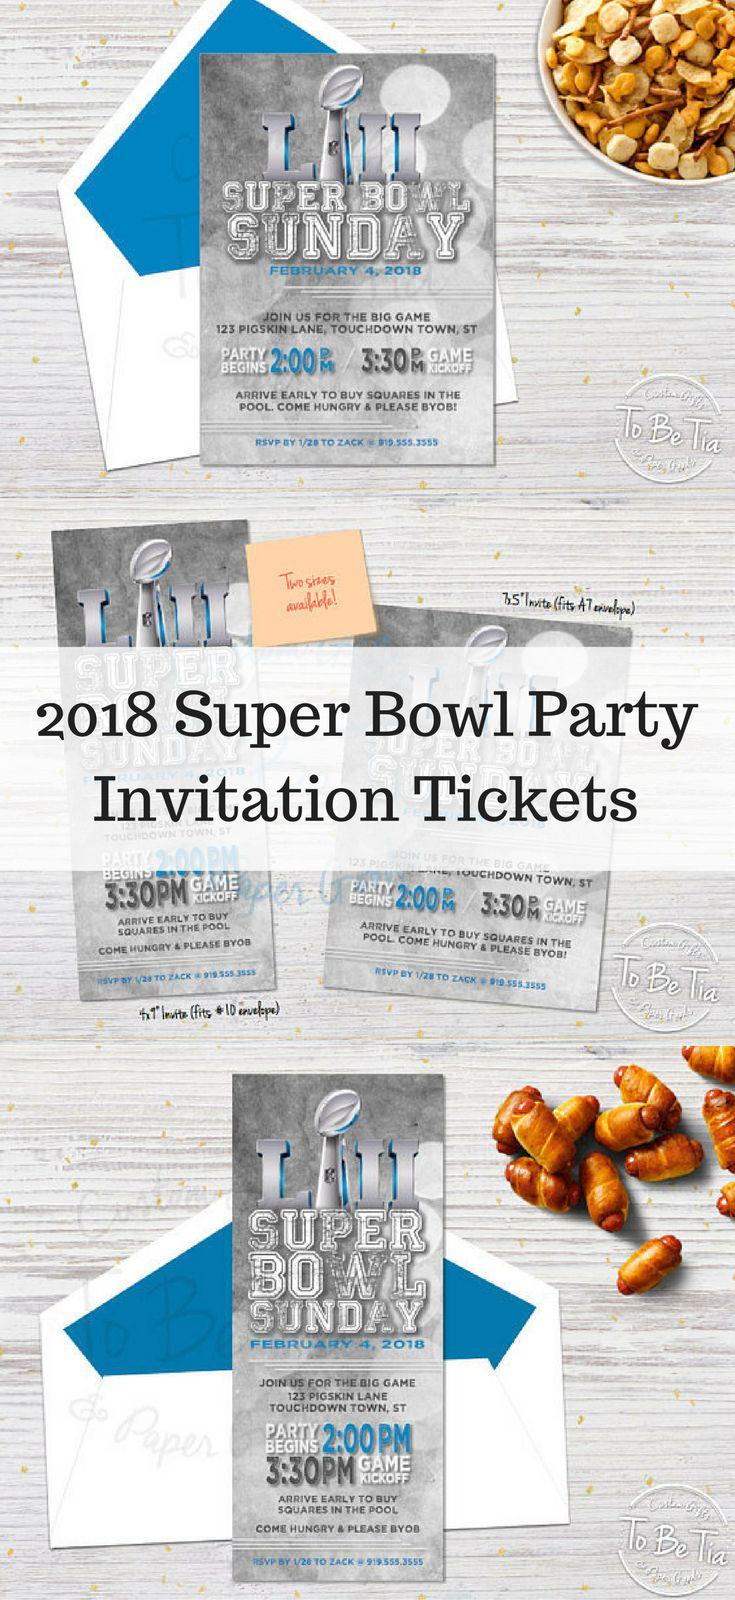 2018 Super Bowl Party Invitation Ticket | Printable Invitation #ad #superbowl #superbowlparty #printable #instantdownload #party #partyideas #invitations #invitation